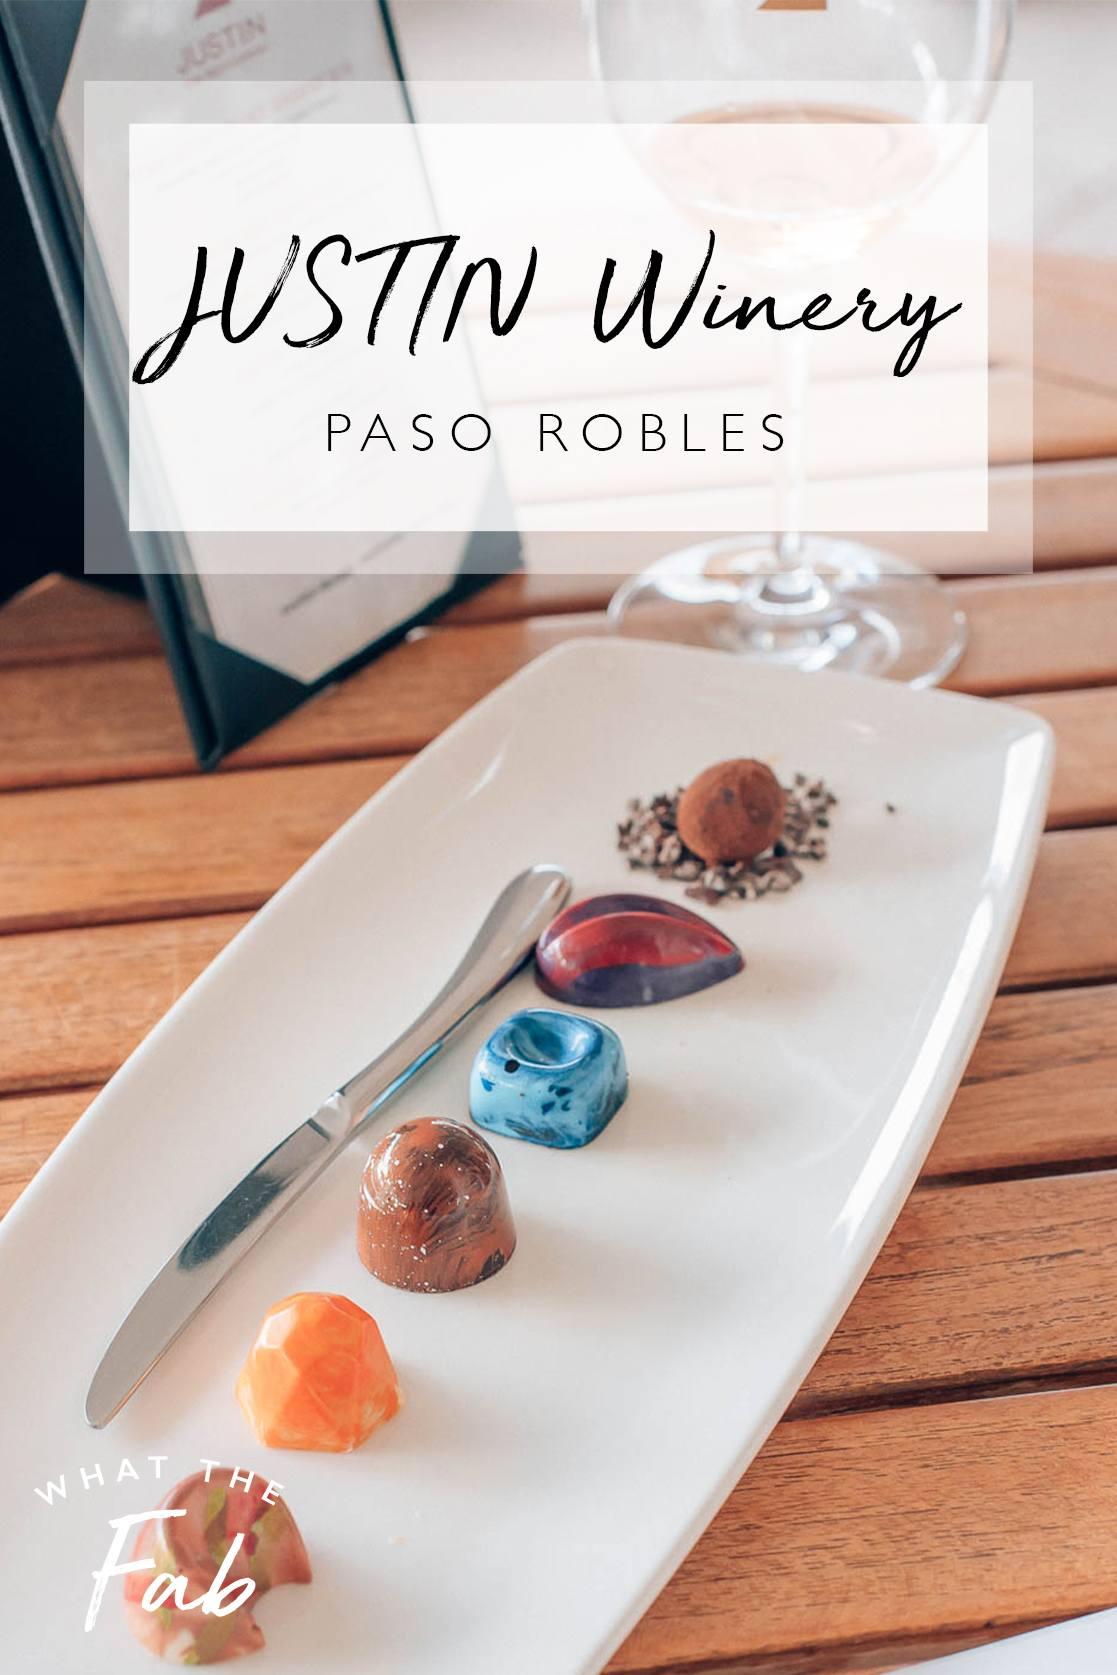 Justin Winery Paso Robles, CA